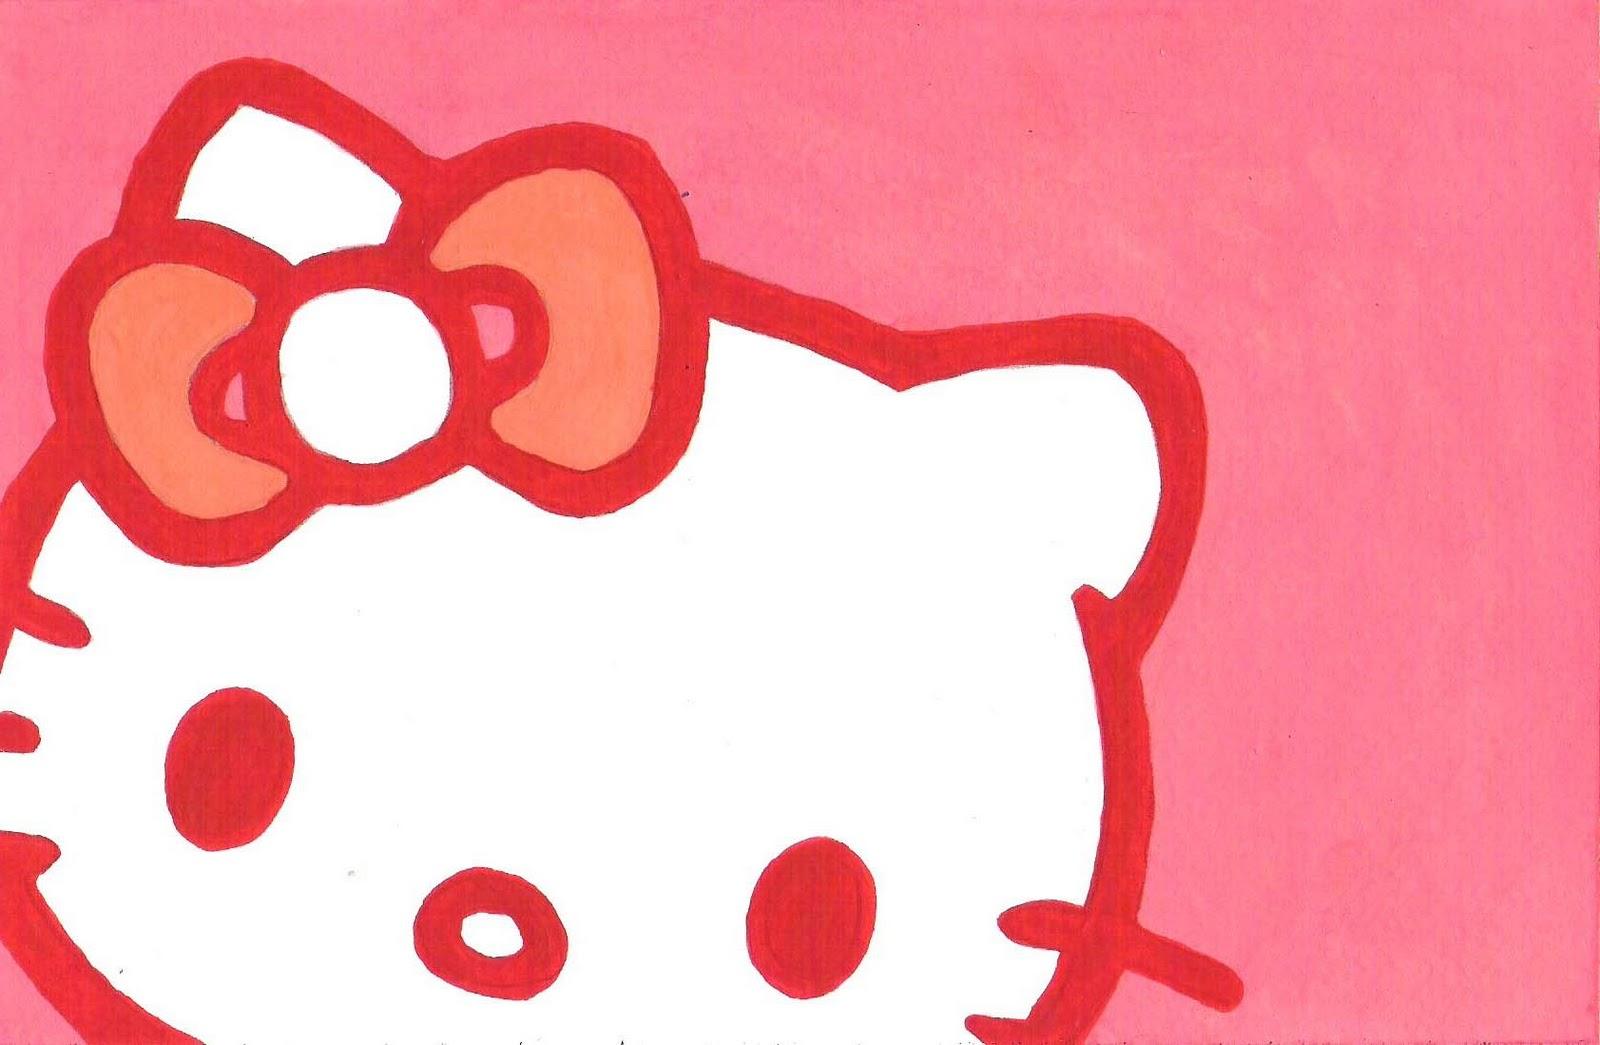 Hello Kitty Wedding Gift: Jodi-lynn's Blog: Hello Kitty Wedding